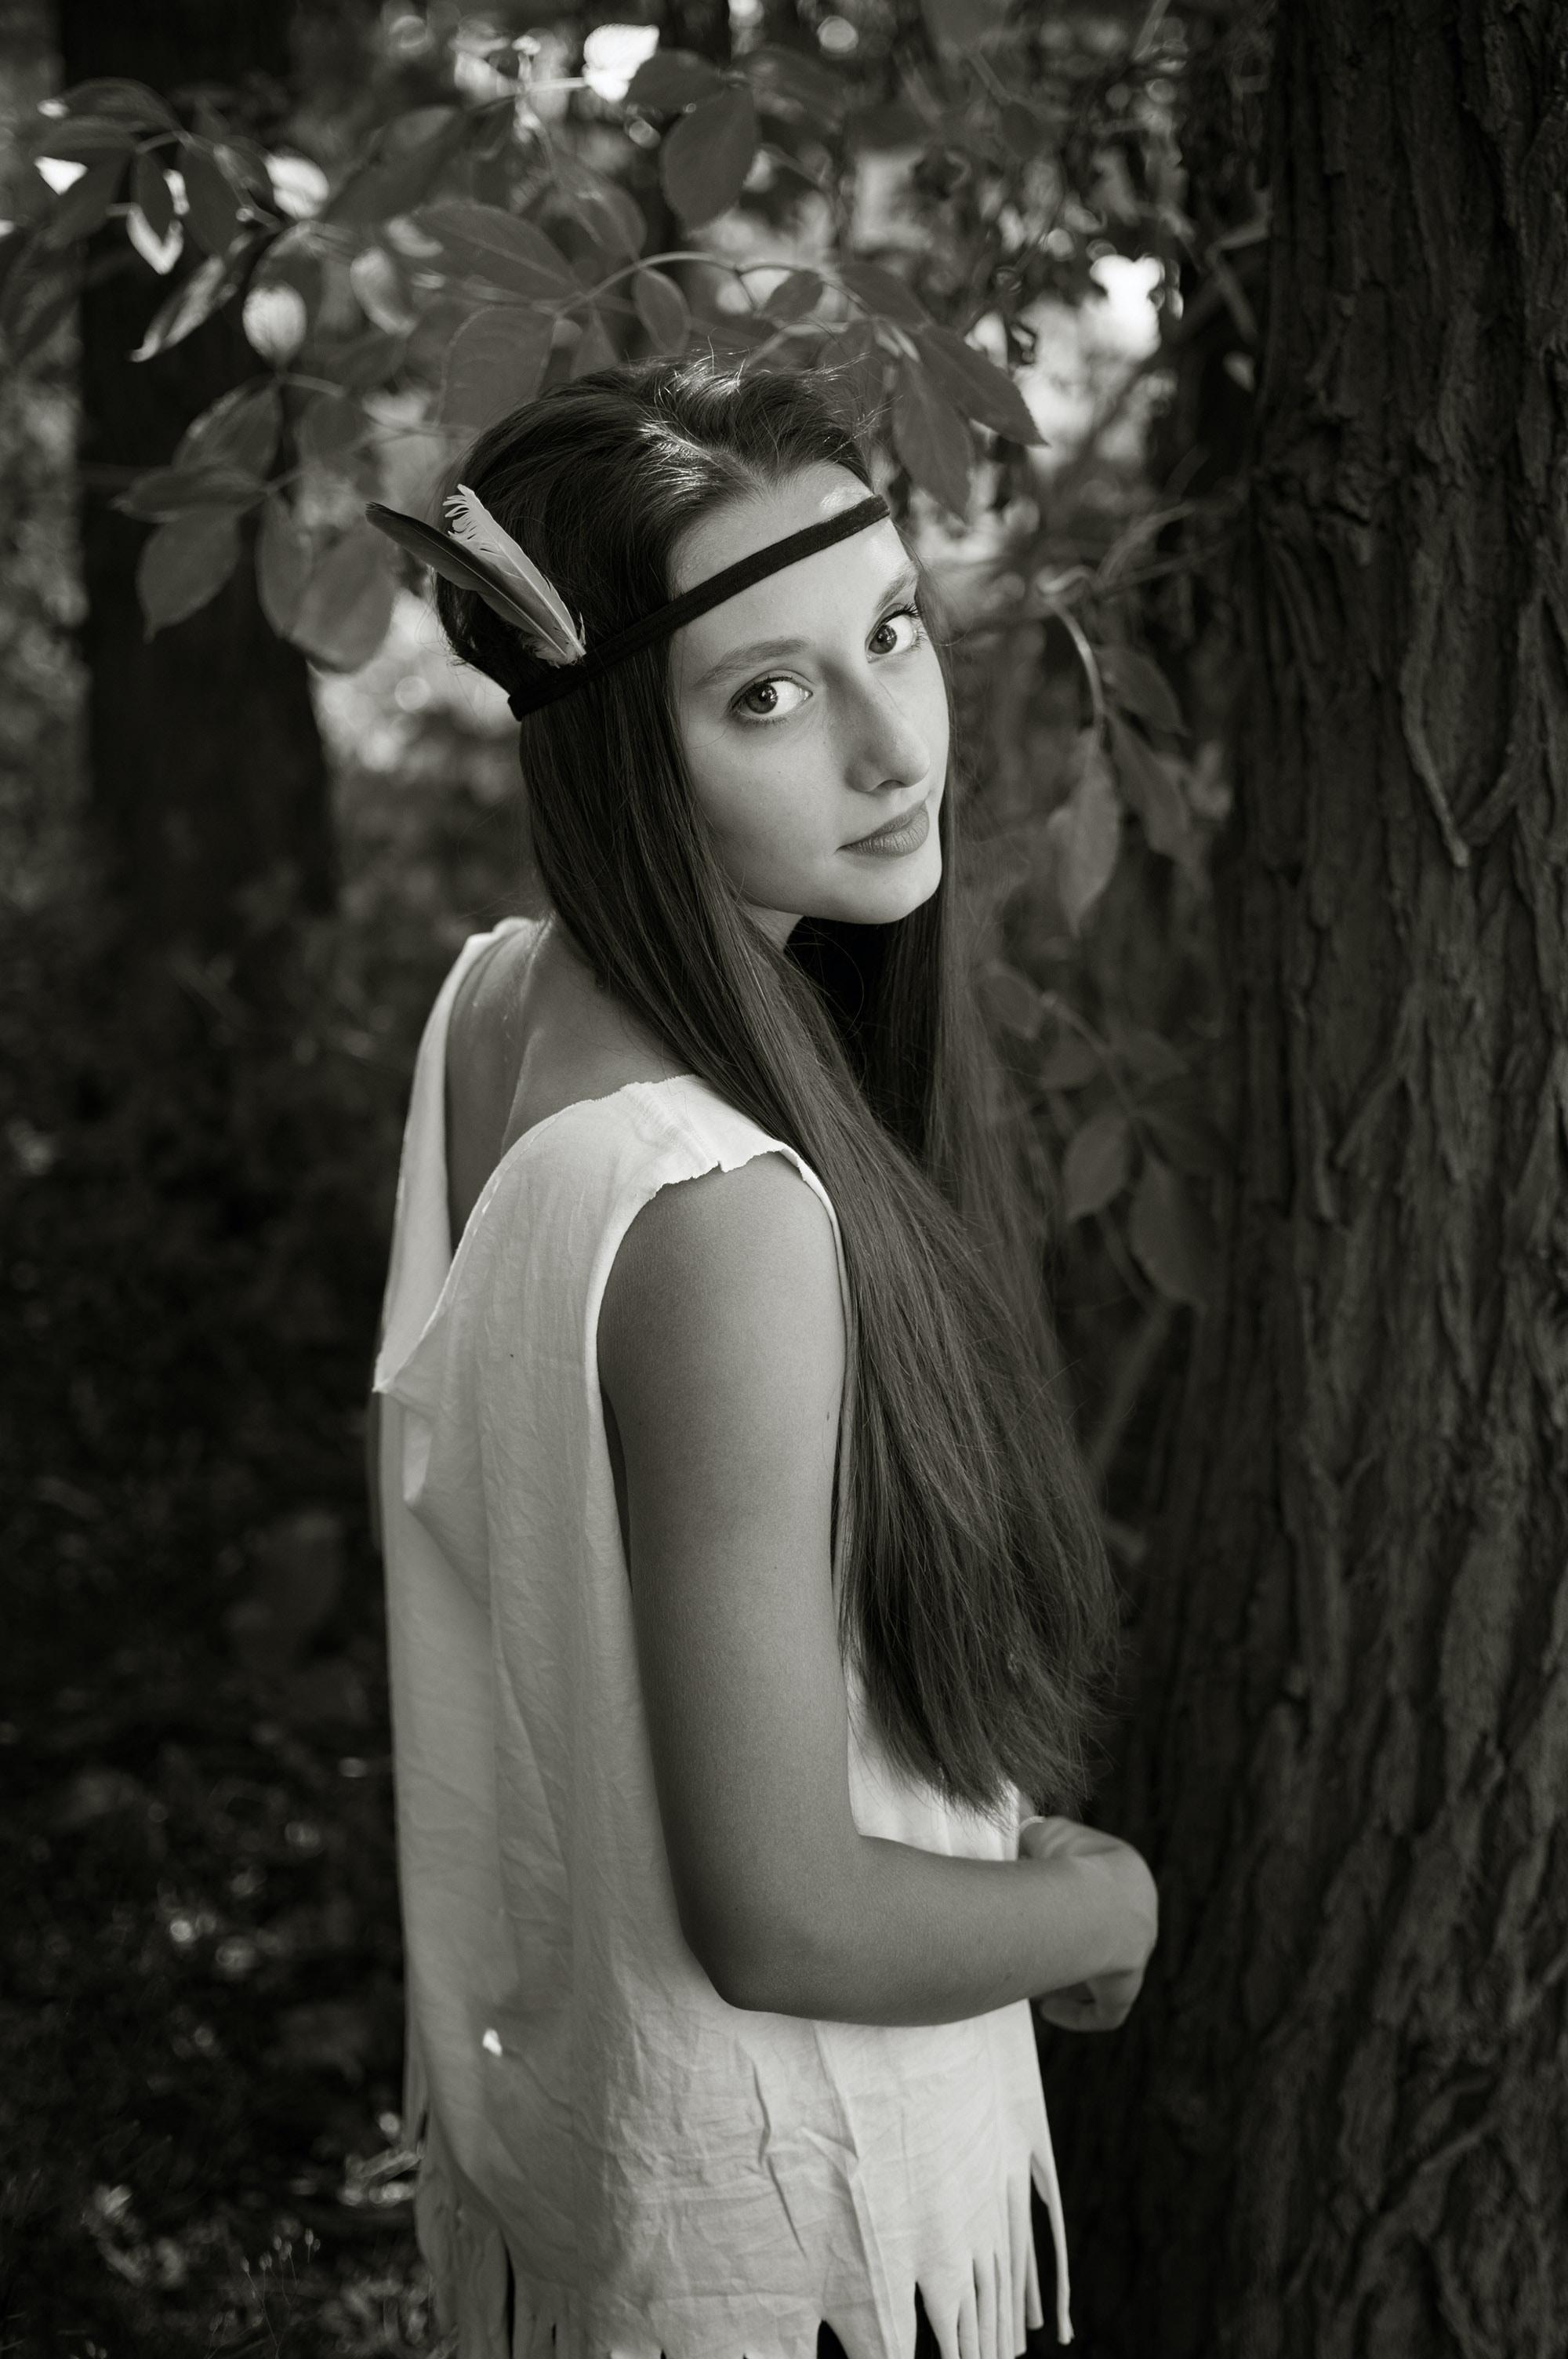 grayscale photo of woman near tree